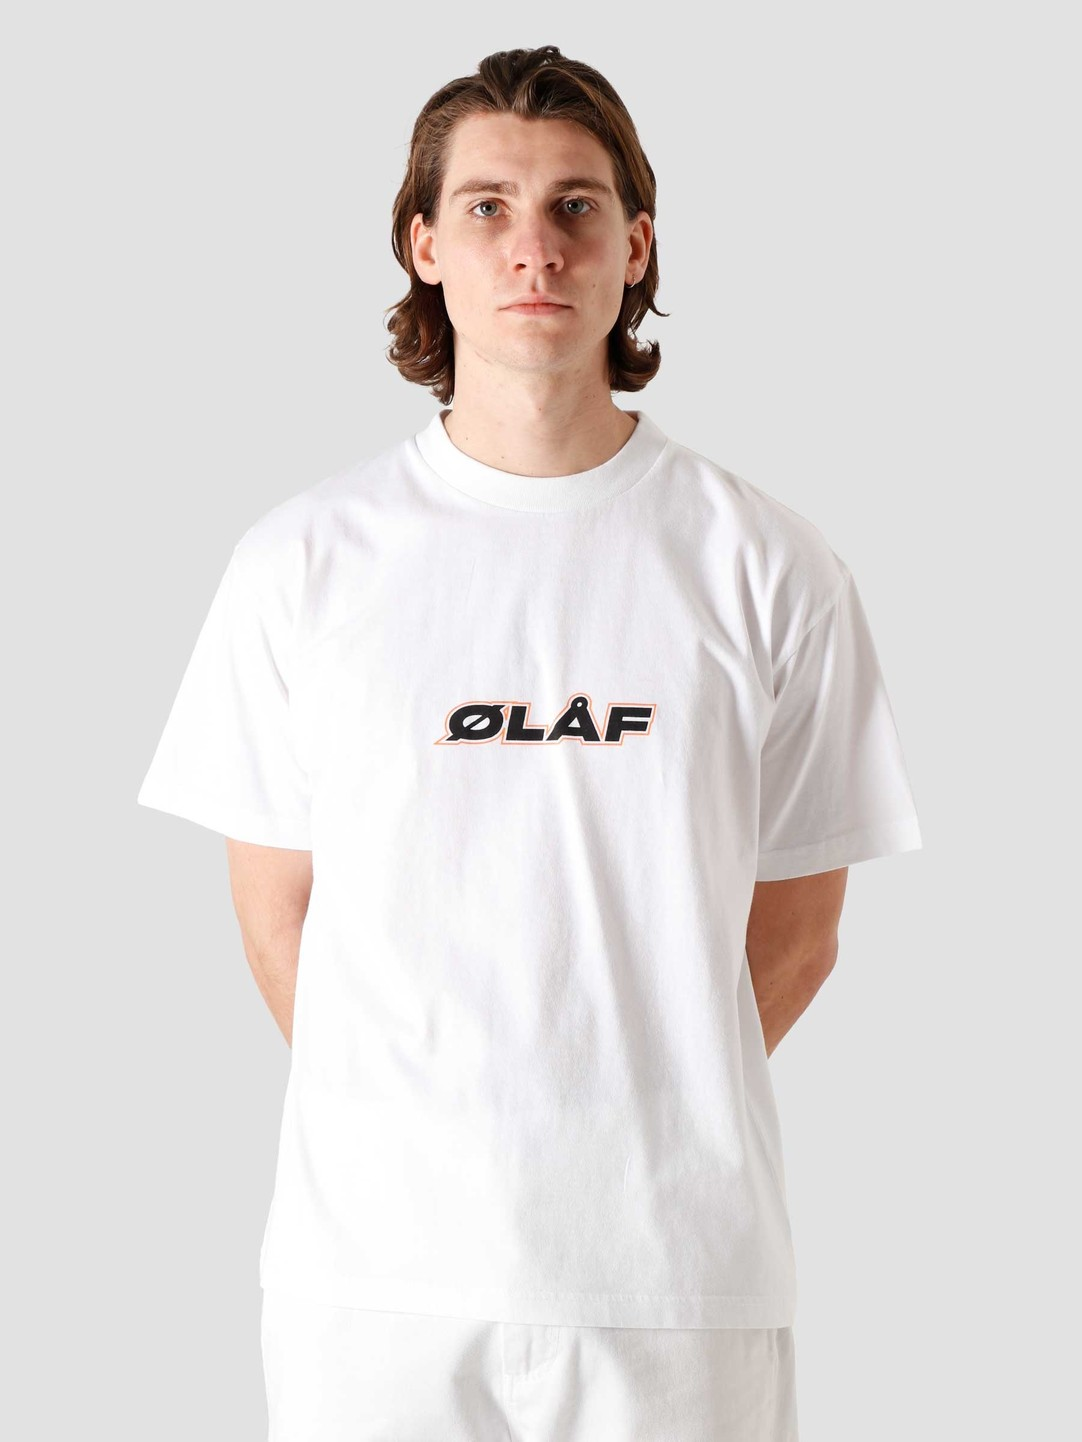 Olaf Hussein Olaf Hussein OH Italic T-Shirt White SP21